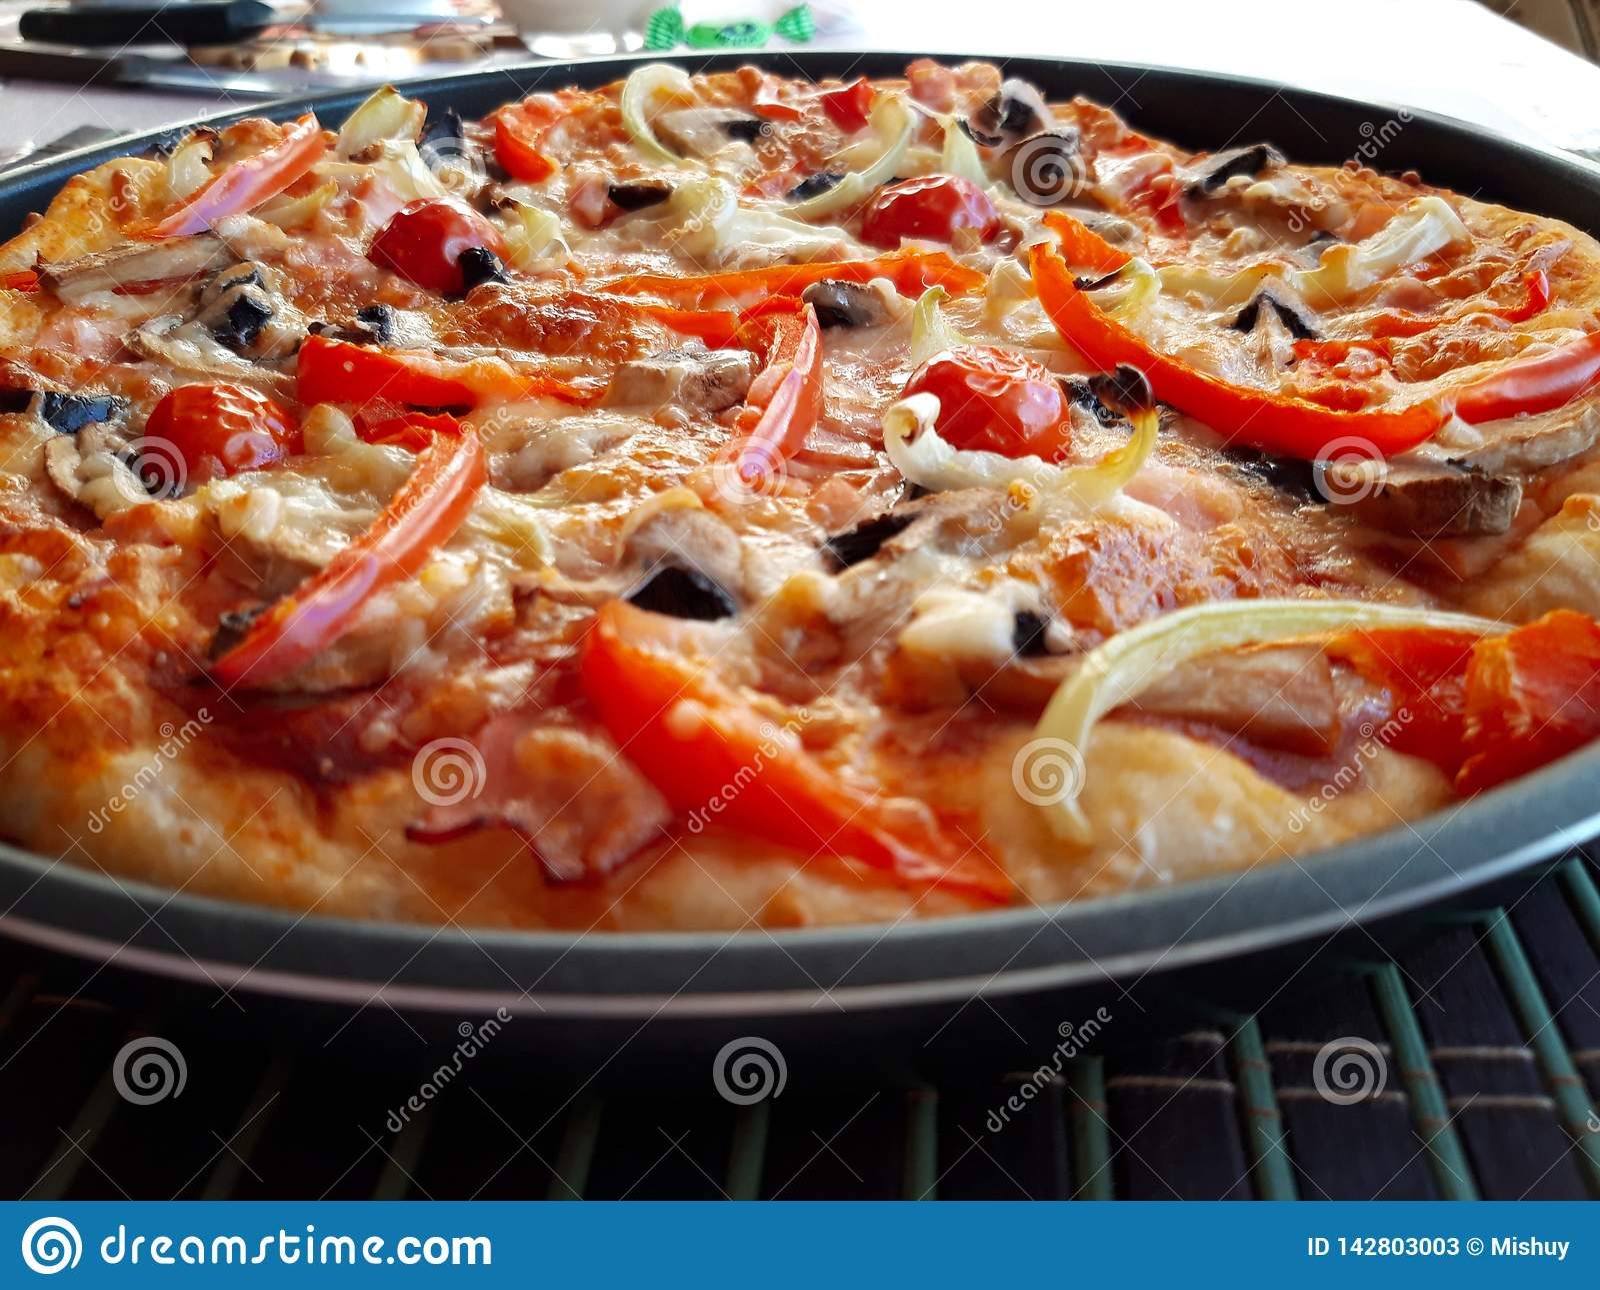 Delicious italian fresh baked pizza